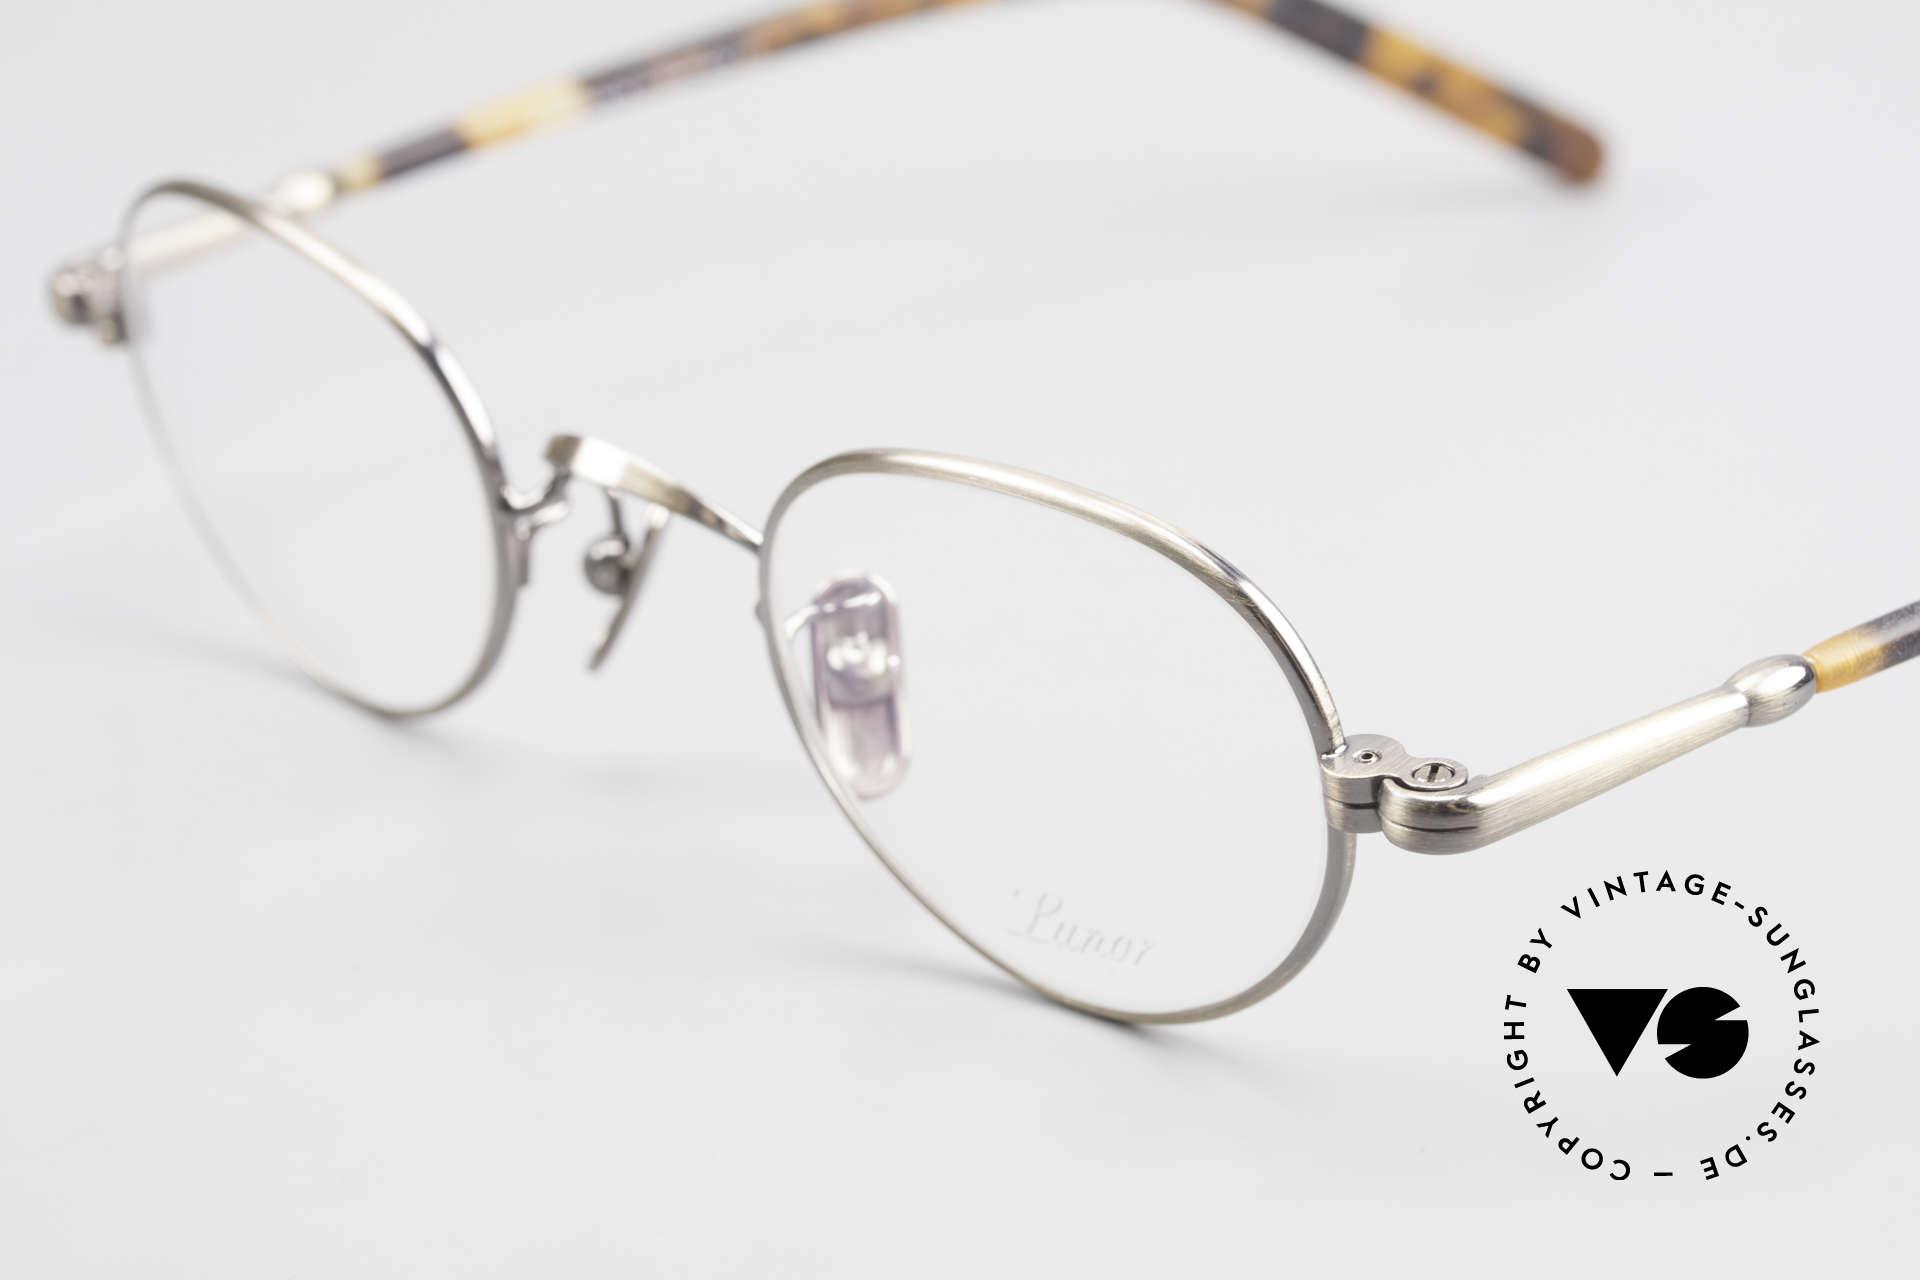 Lunor VA 103 Lunor Eyeglasses Old Original, model VA 103 = acetate-metal temples & titanium pads, Made for Men and Women